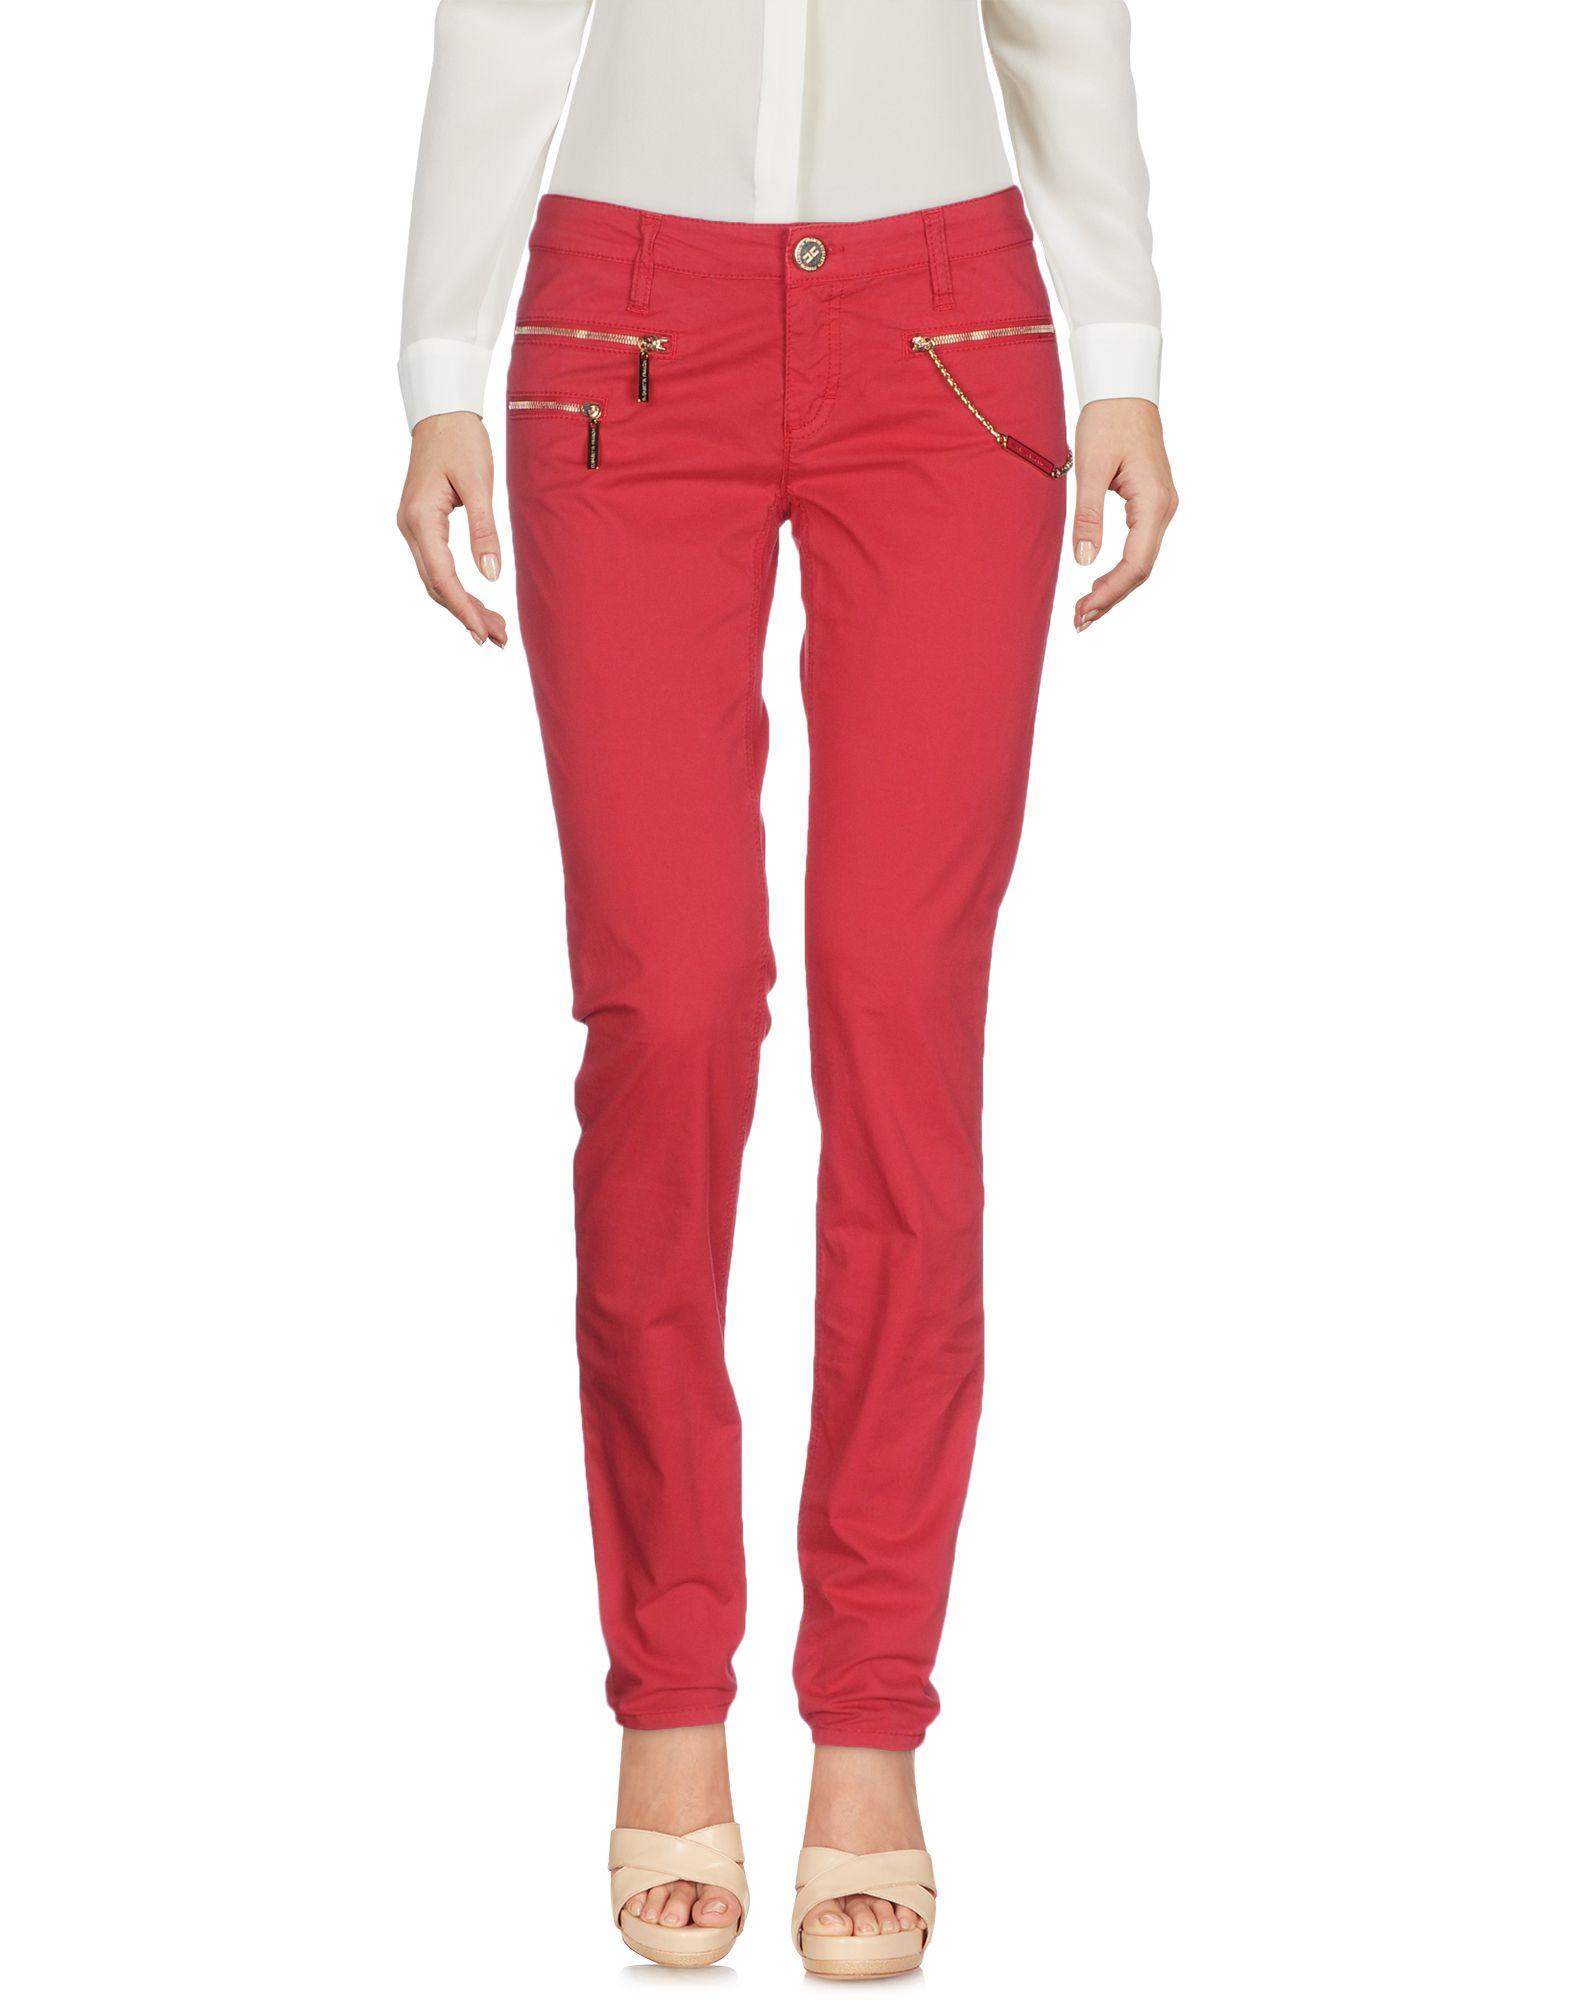 цена ELISABETTA FRANCHI JEANS for CELYN B. Повседневные брюки онлайн в 2017 году